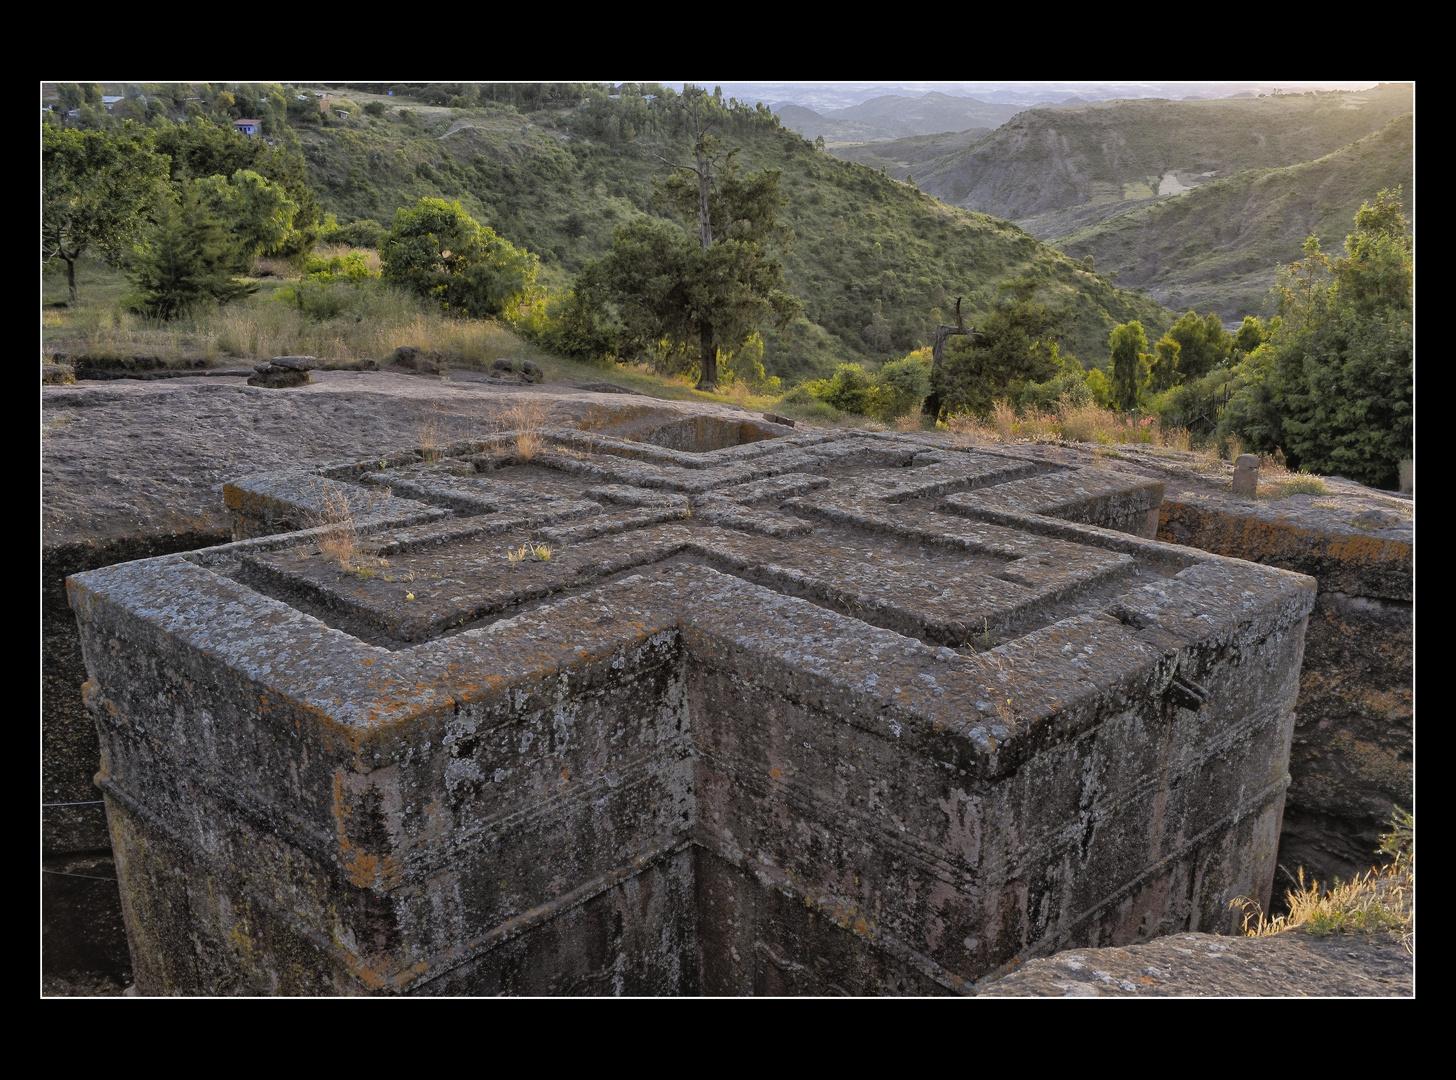 MEMORIAS DE AFRICA-ATARDECER EN IGLESIA SAN JORJE-LALIBELA-ETIOPIA